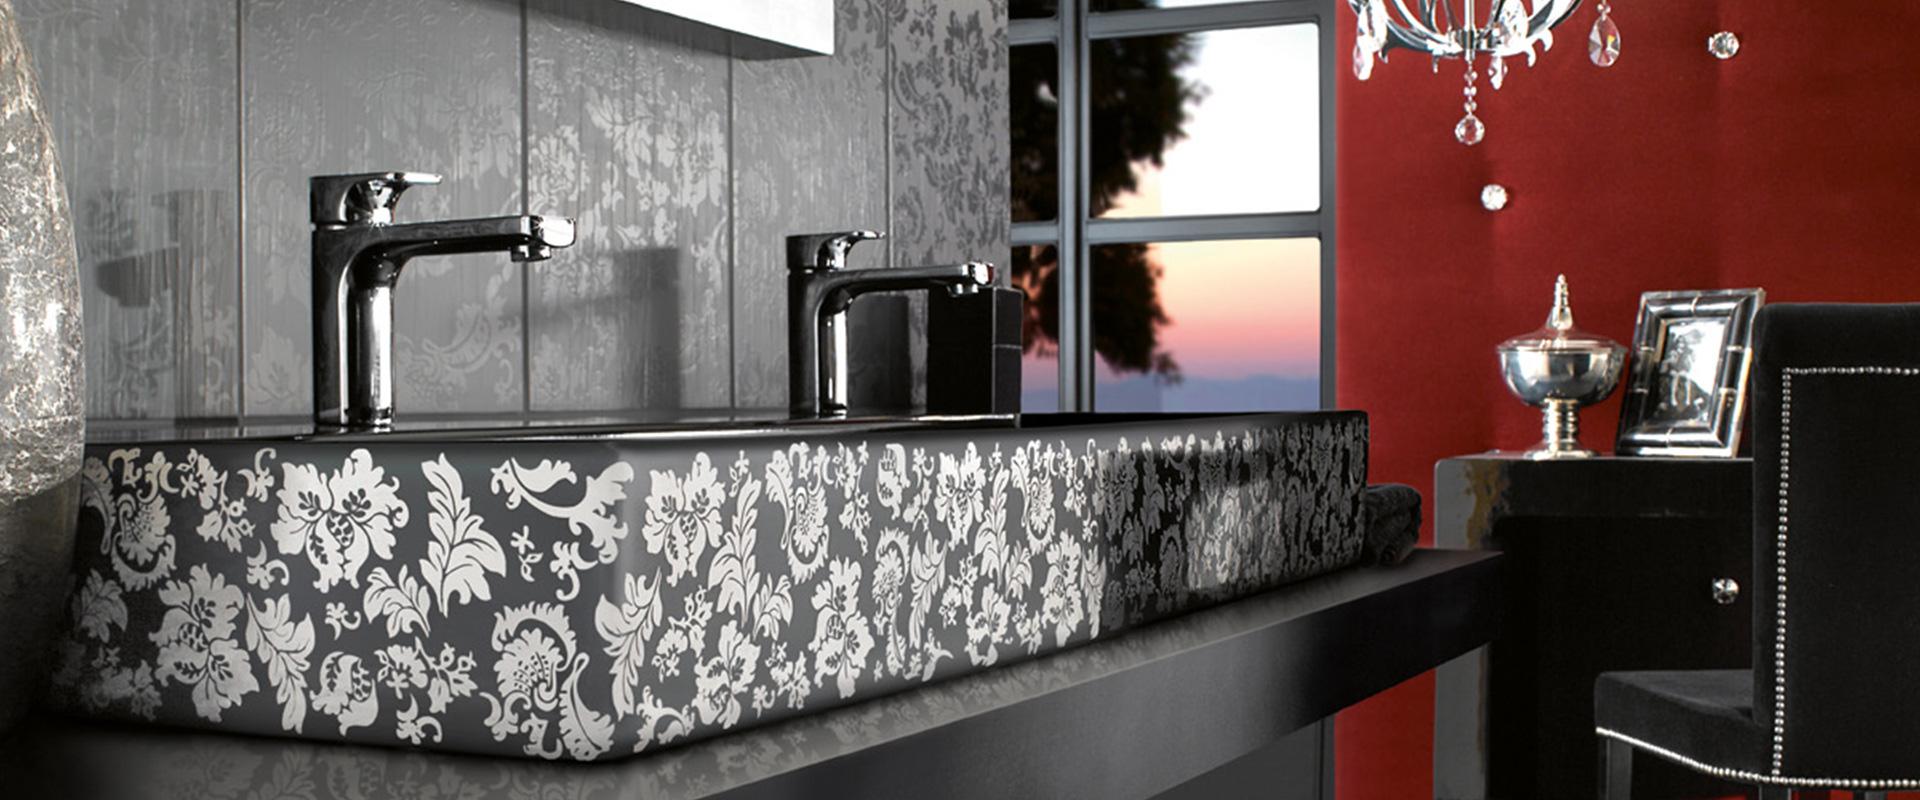 bathroom design with villeroy boch creative and modern. Interior Design Ideas. Home Design Ideas